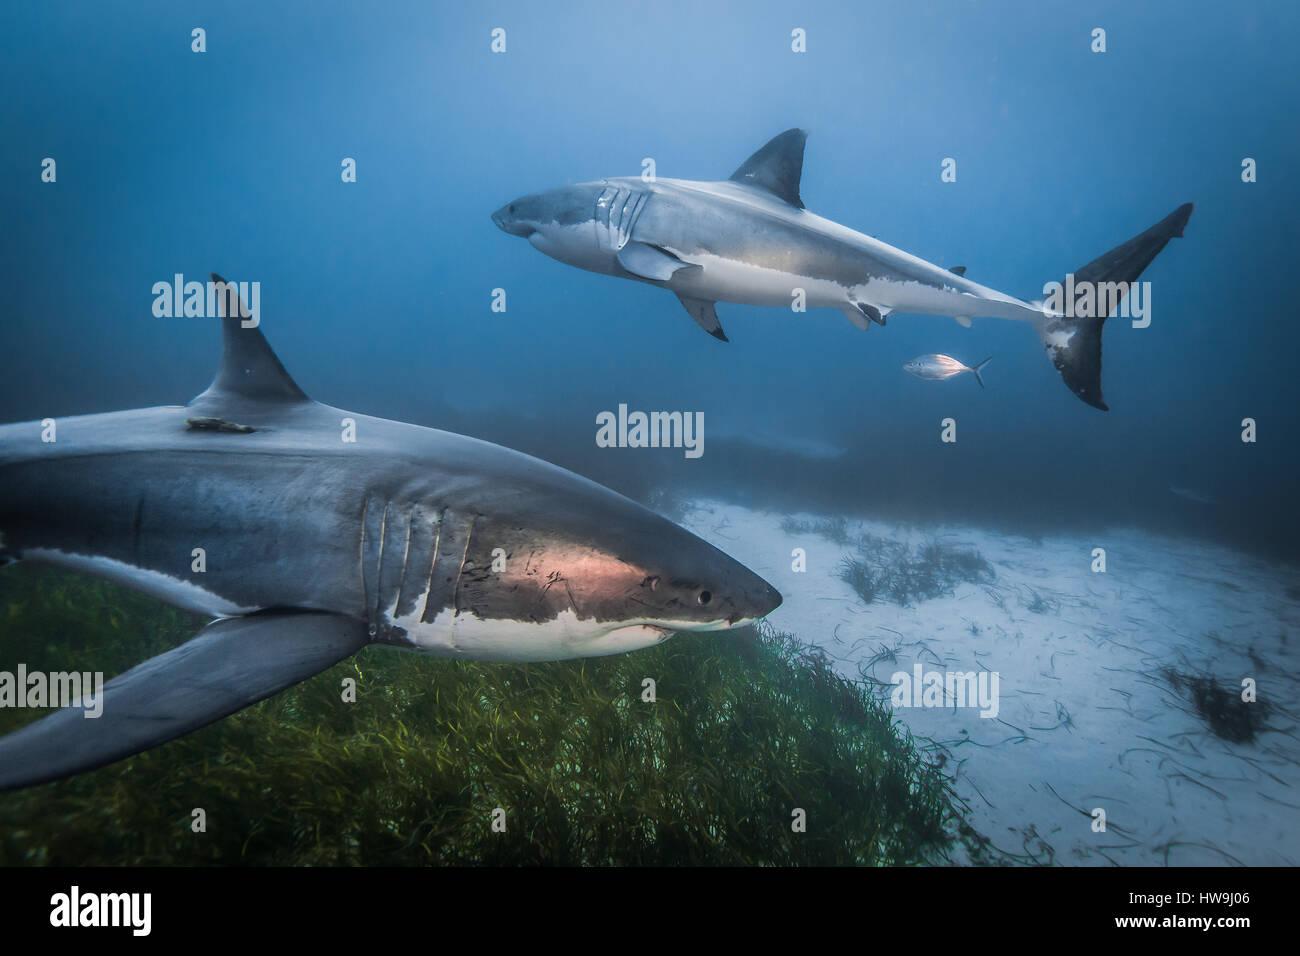 Fox Shark Imágenes De Stock & Fox Shark Fotos De Stock - Alamy